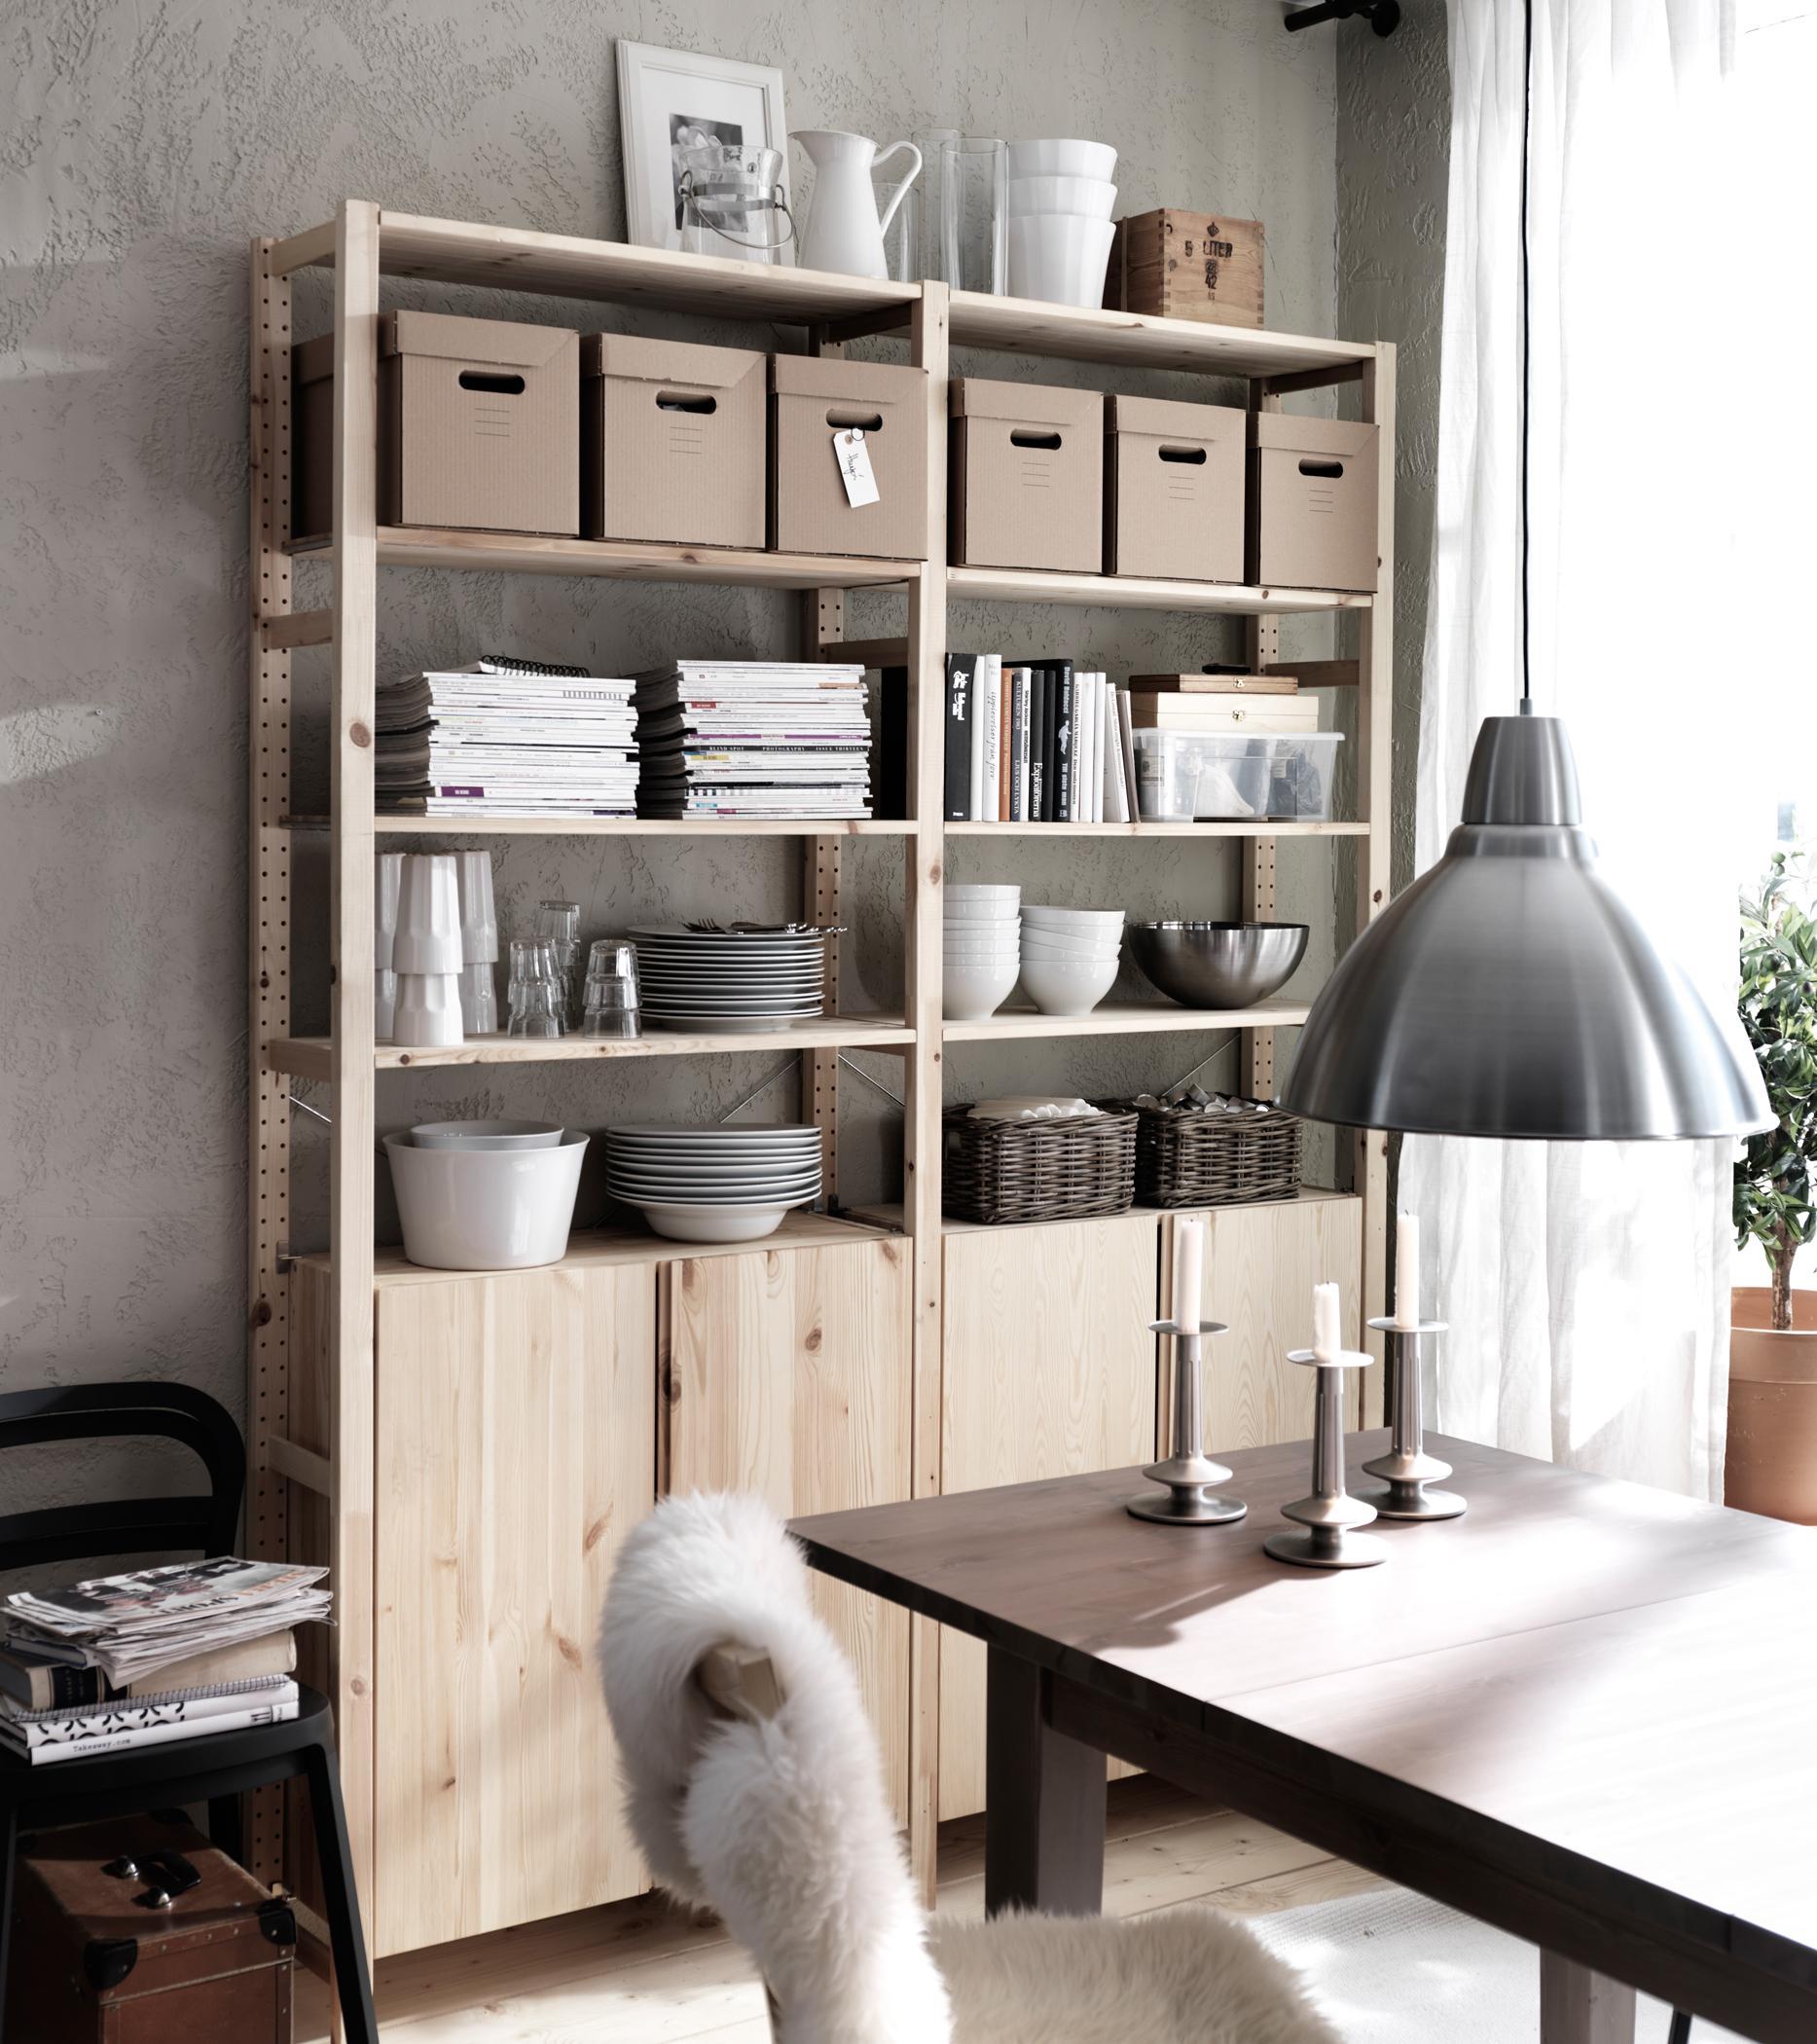 Regalsystem Im Esszimmer Ikea Regalwand Ikearegal Ordnungssystem CInter IKEA